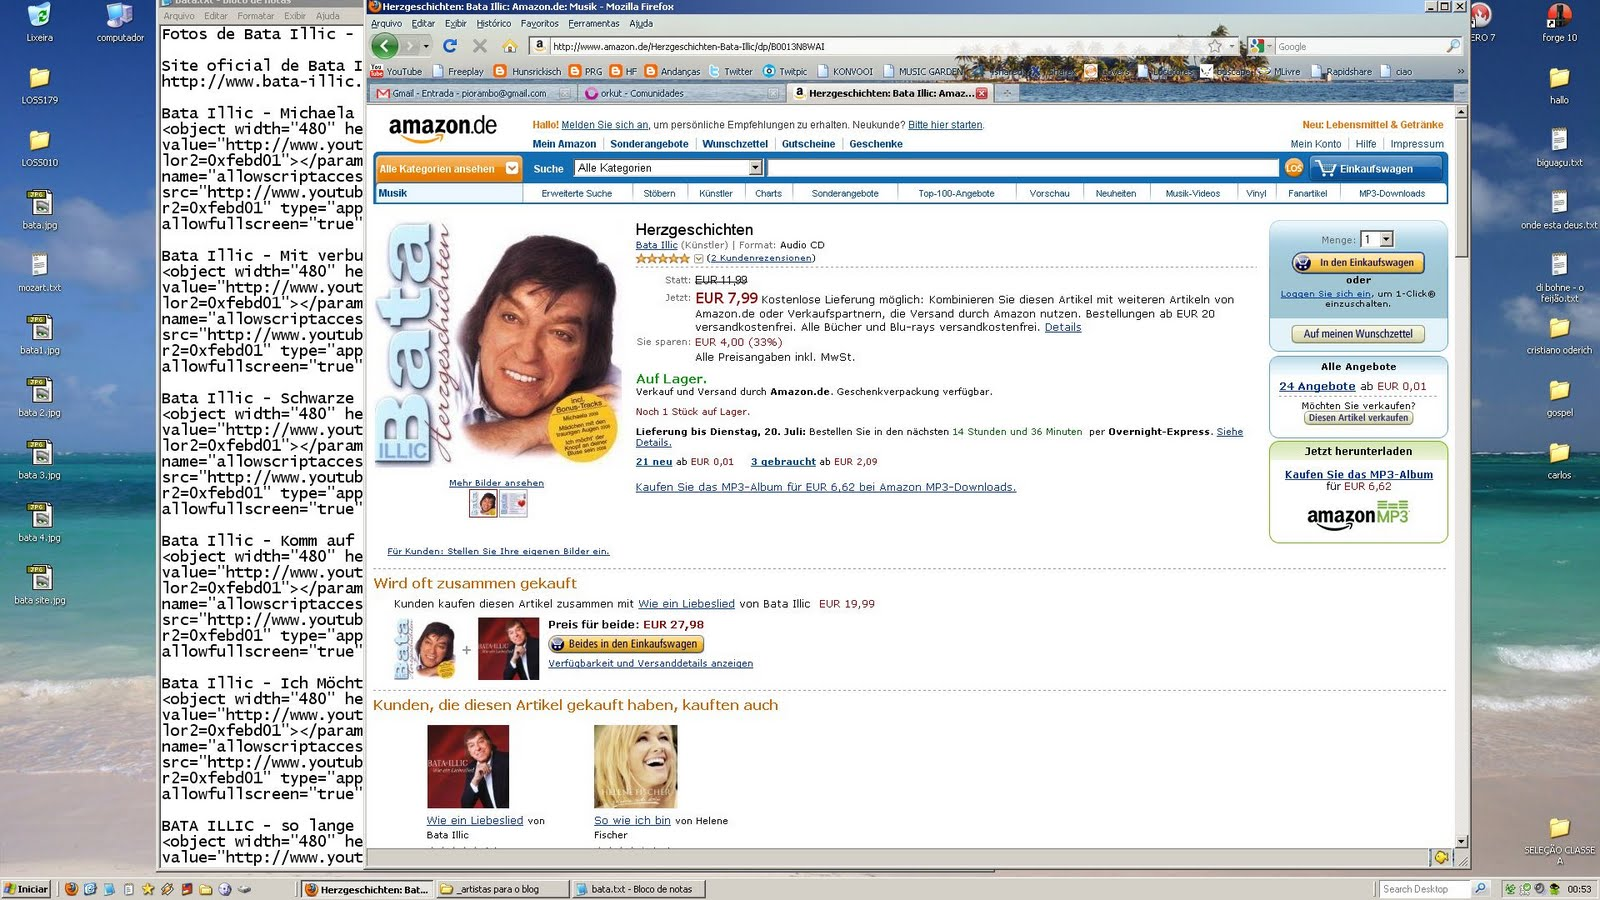 http://3.bp.blogspot.com/_Ngornze07jY/TEPPDX3ob0I/AAAAAAAADCM/IGV6Hmq3m9w/s1600/bata+kaufen.jpg